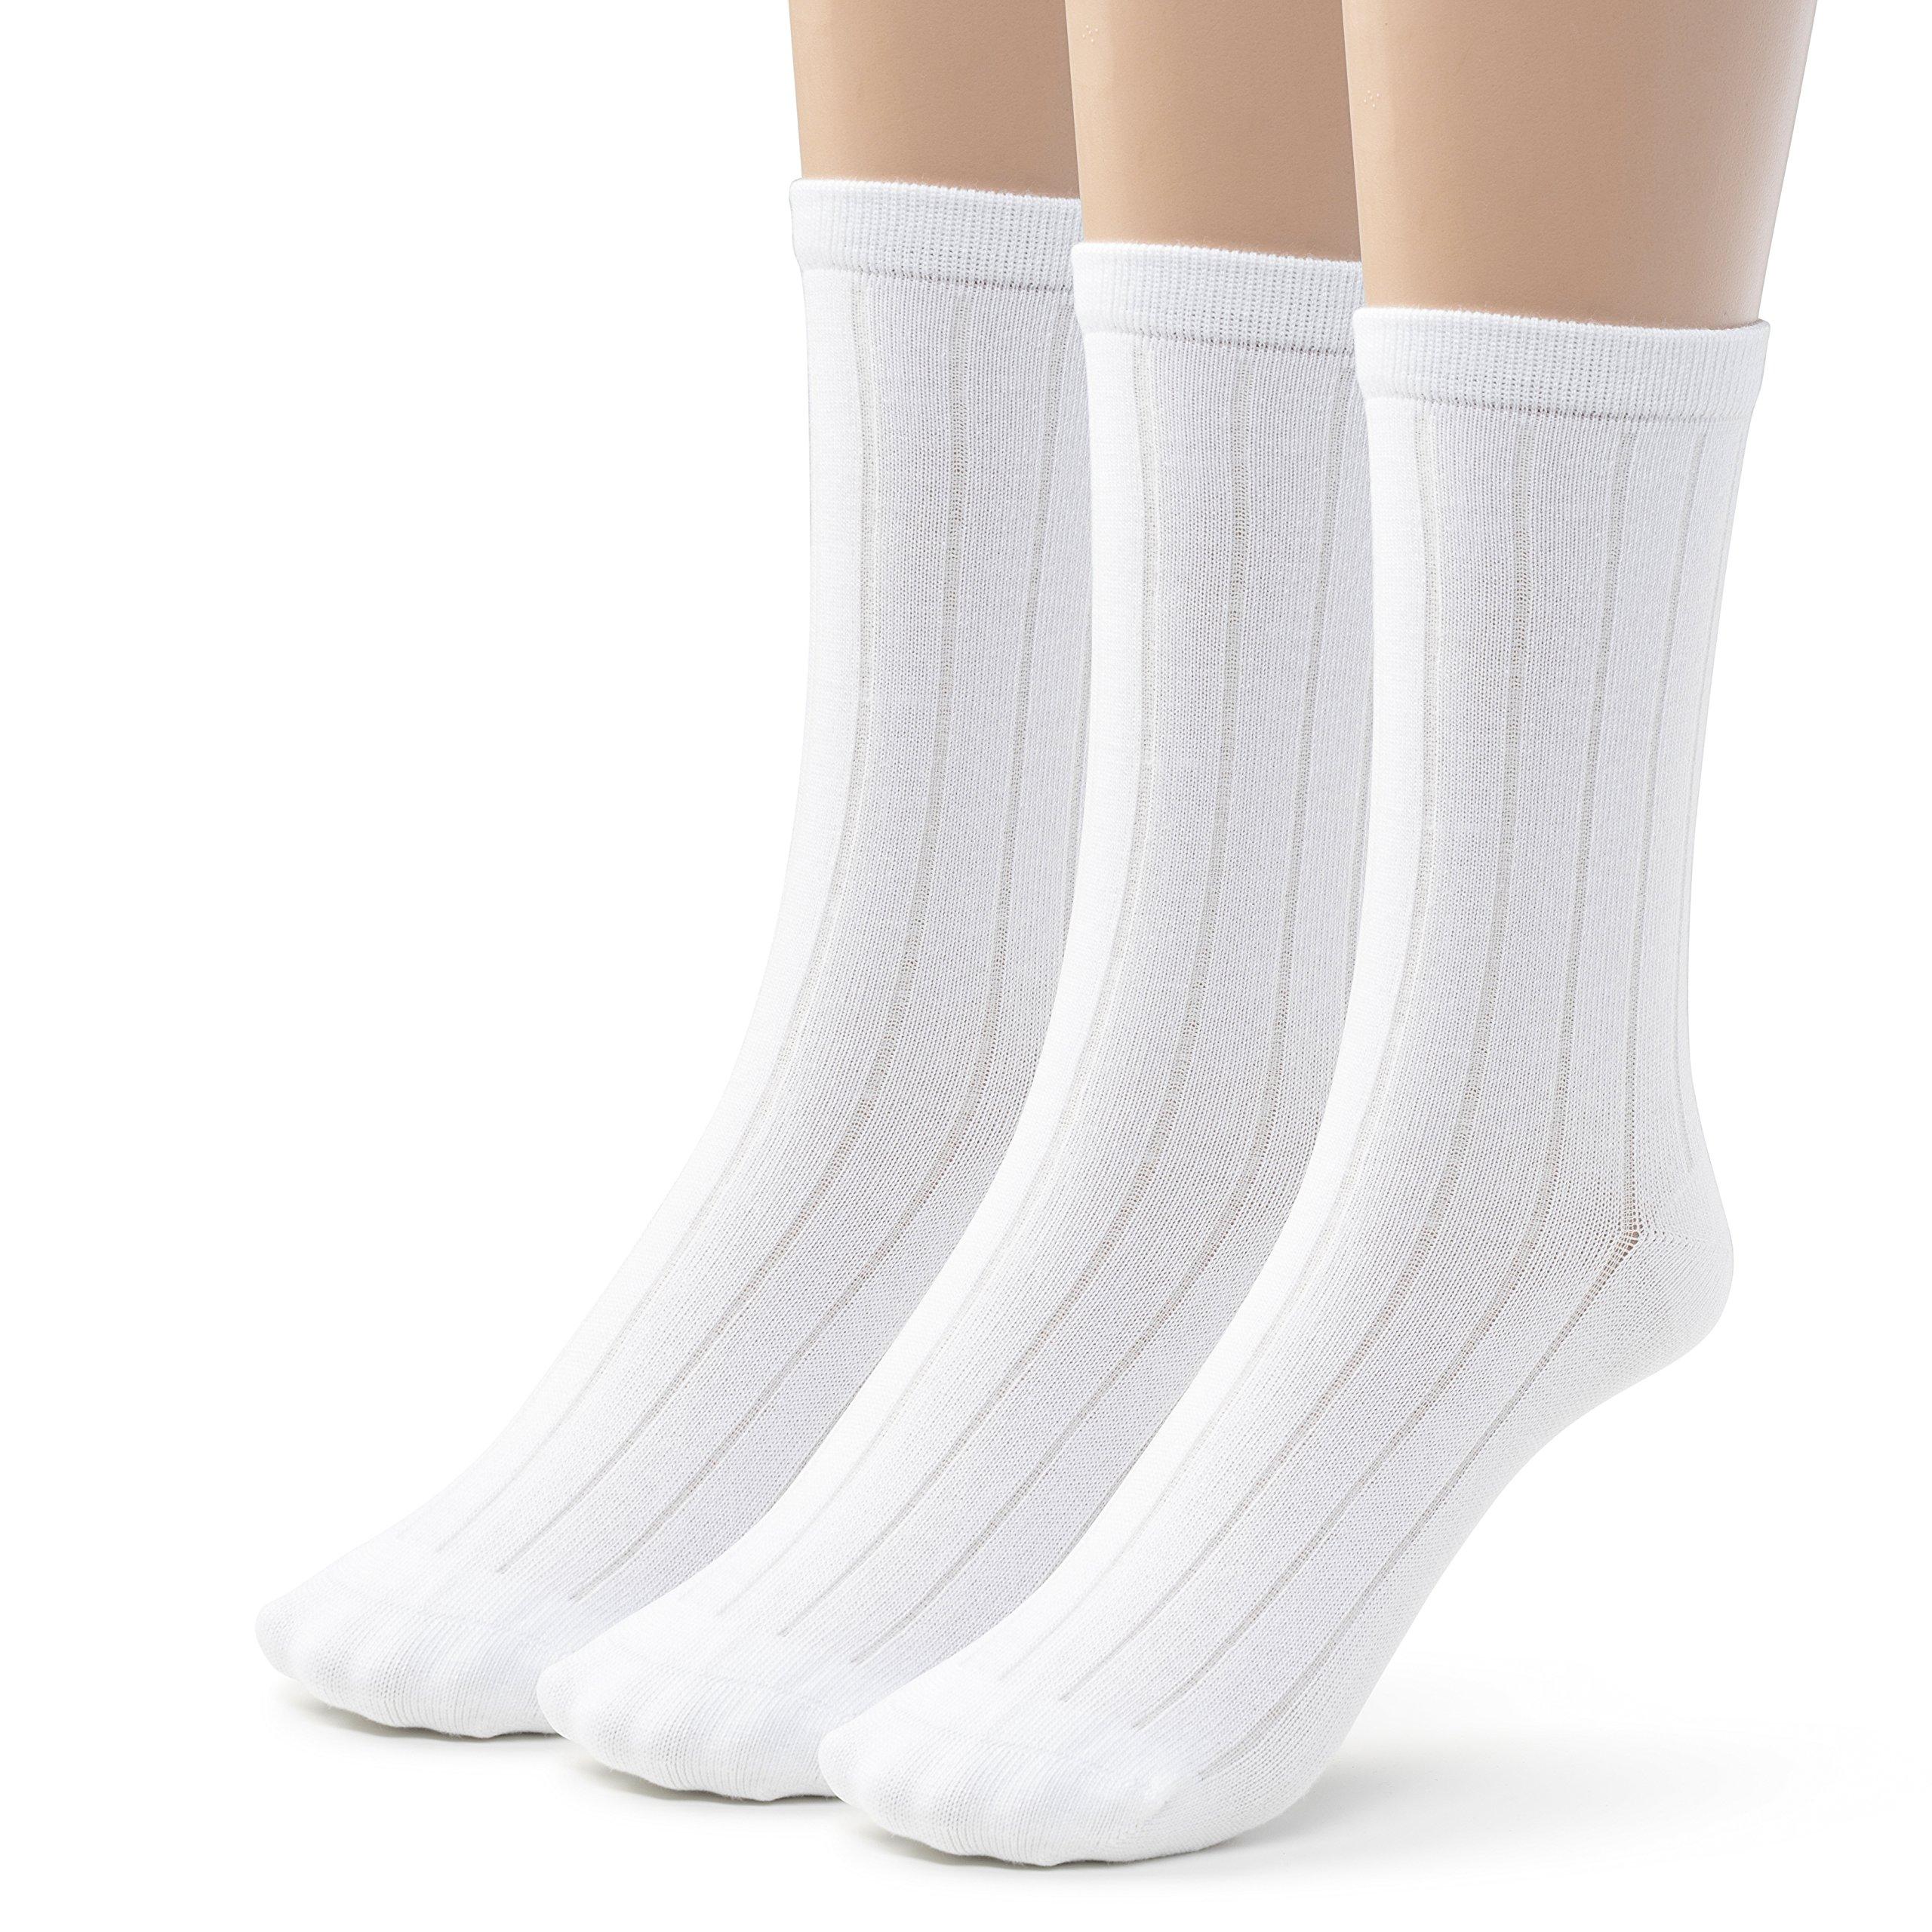 Silky Toes Bamboo Cotton Ribbed Crew Boys School Uniform Socks (Small (7-8), White)